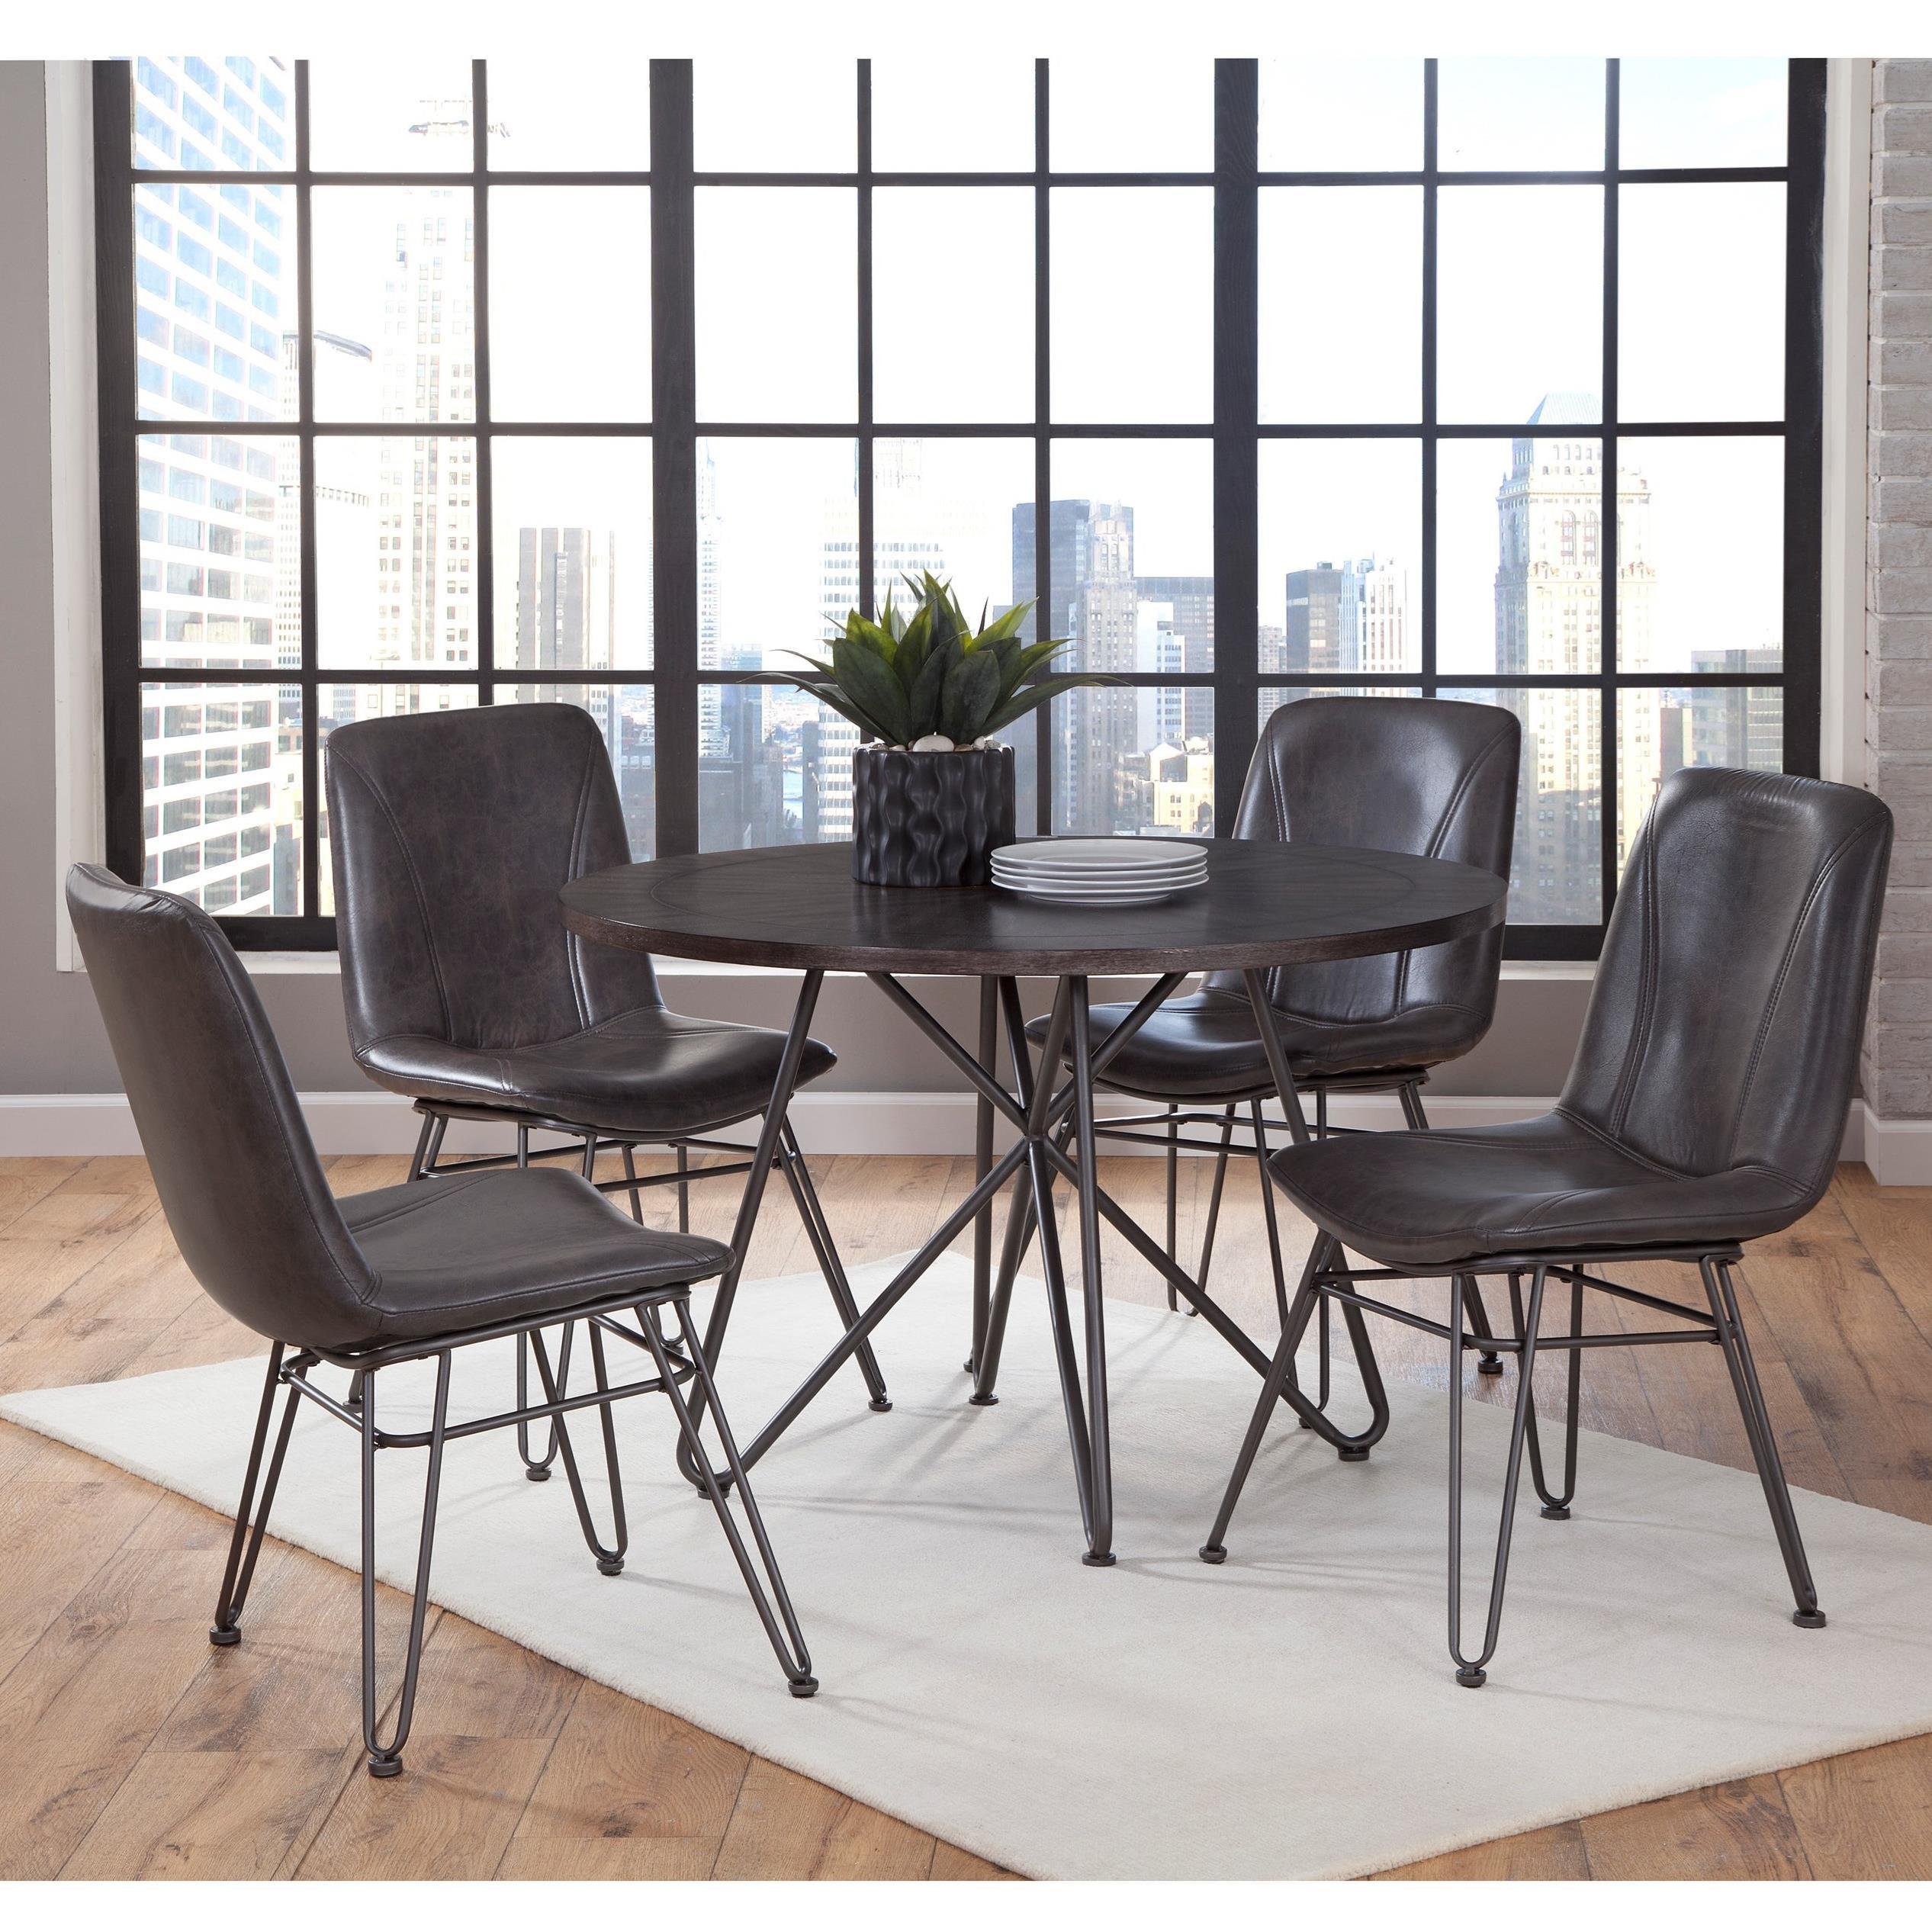 Levits Furniture: Steve Silver Derek 5 Piece Industrial Dining Set